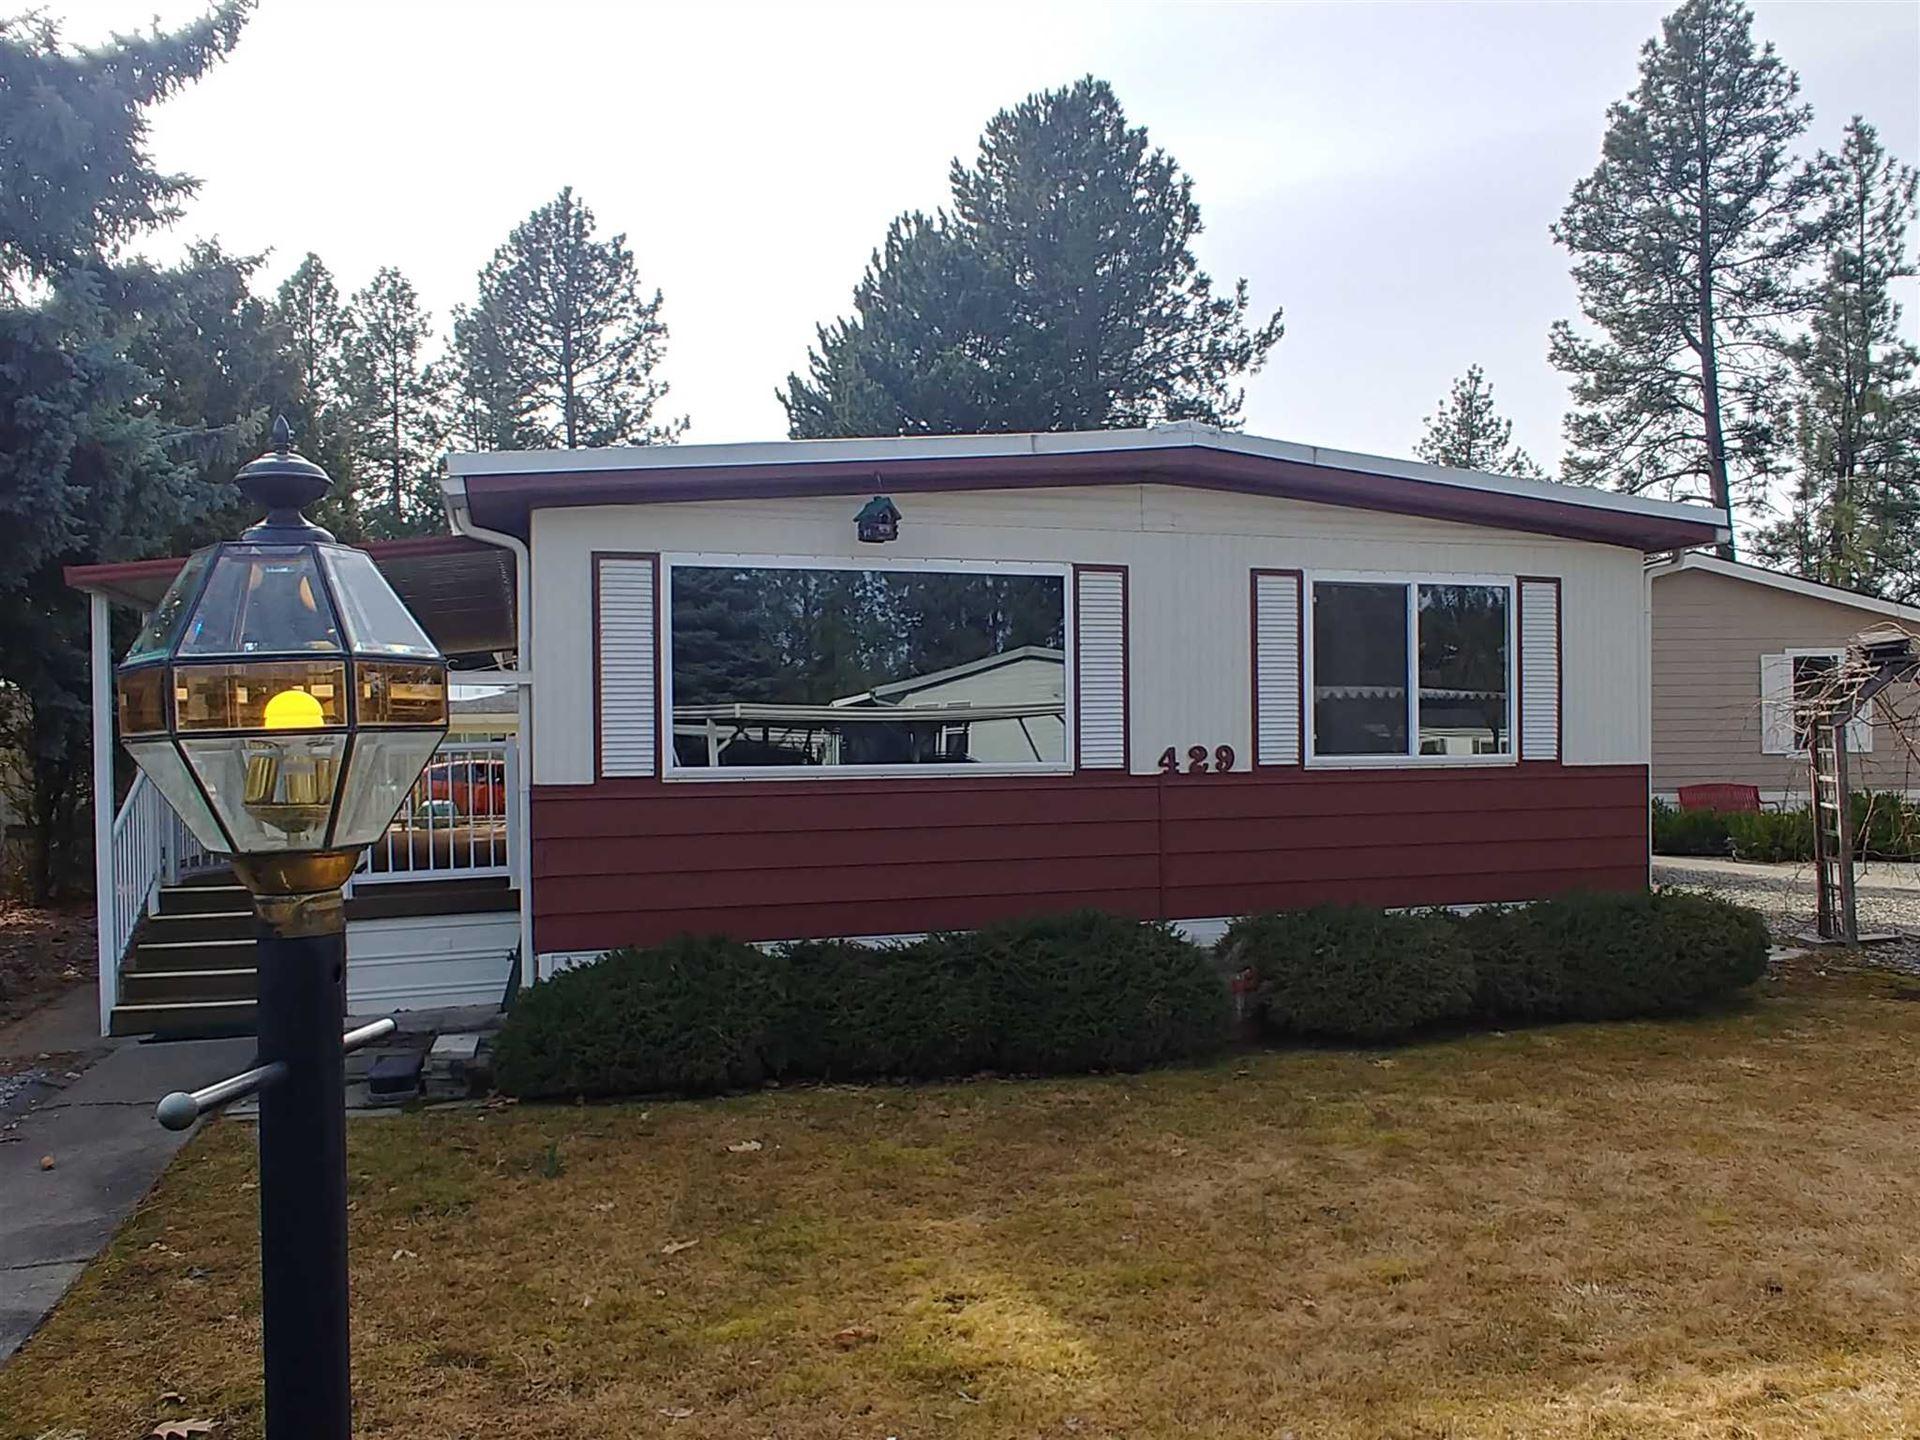 3231 W Boone Ave #429, Spokane, WA 99201 - #: 202112328